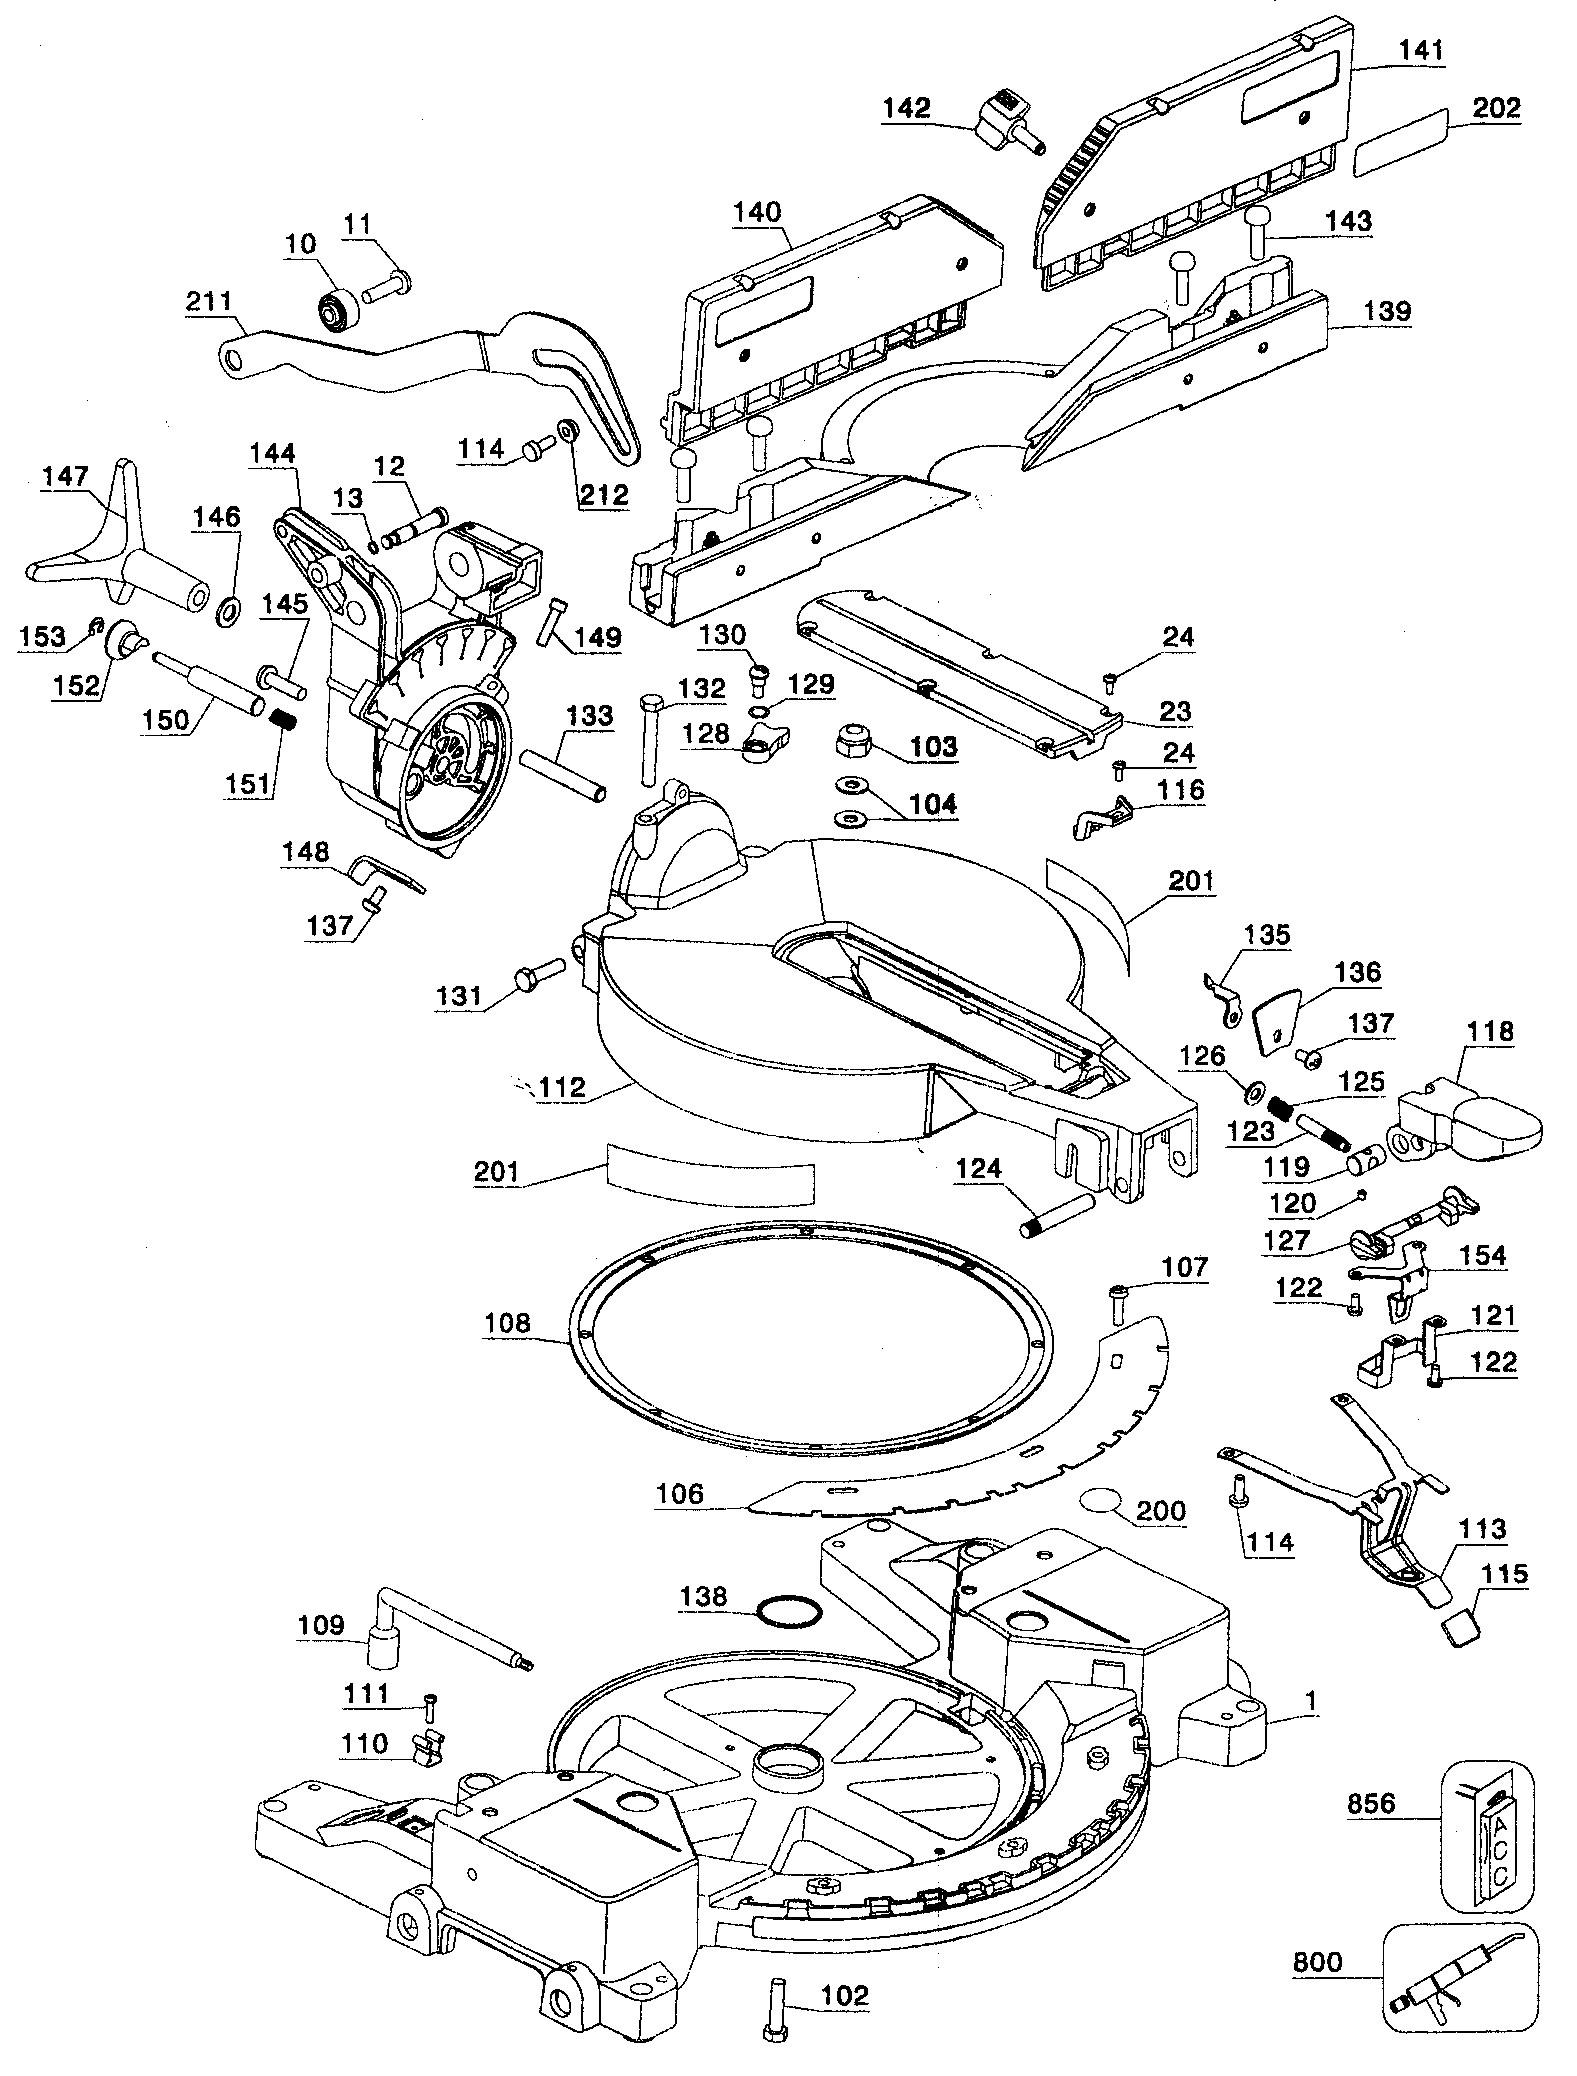 Dewalt Miter Saw Parts Diagram Dewalt Model Dw716 Type1 Miter Saw Genuine Parts Of Dewalt Miter Saw Parts Diagram